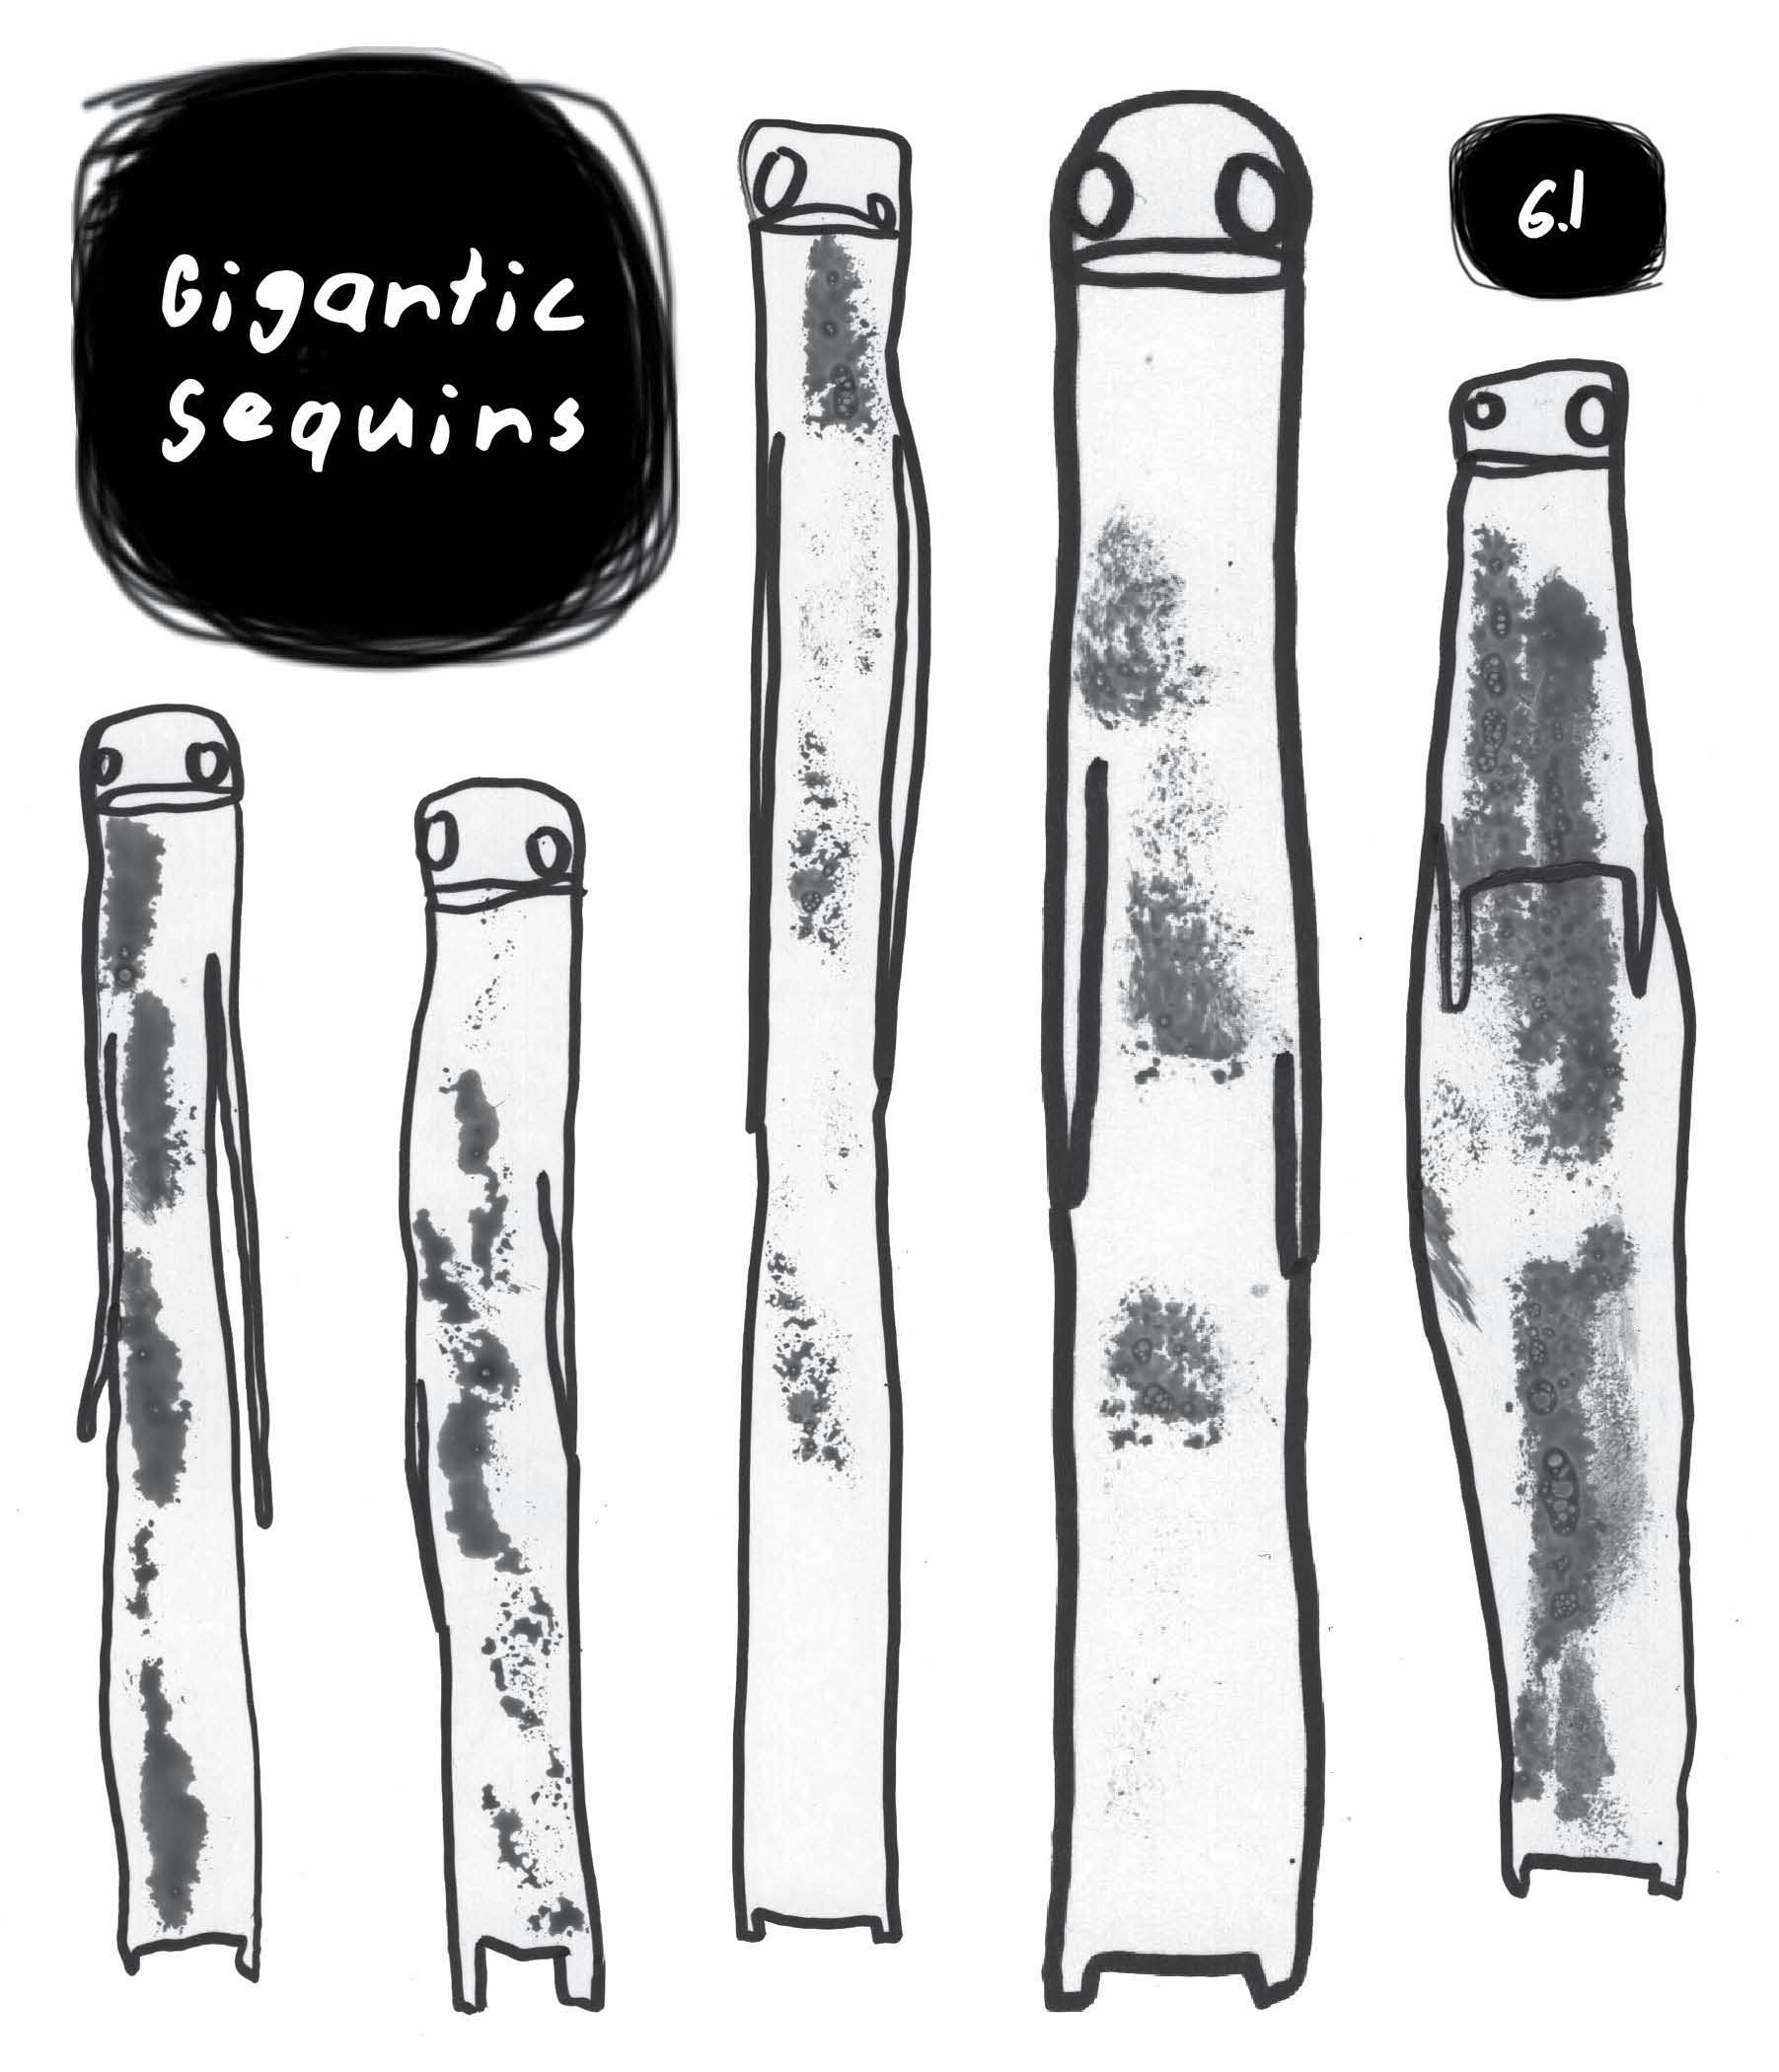 Gigantic Sequins  , issue 6.1. Cover art by Erkembode.